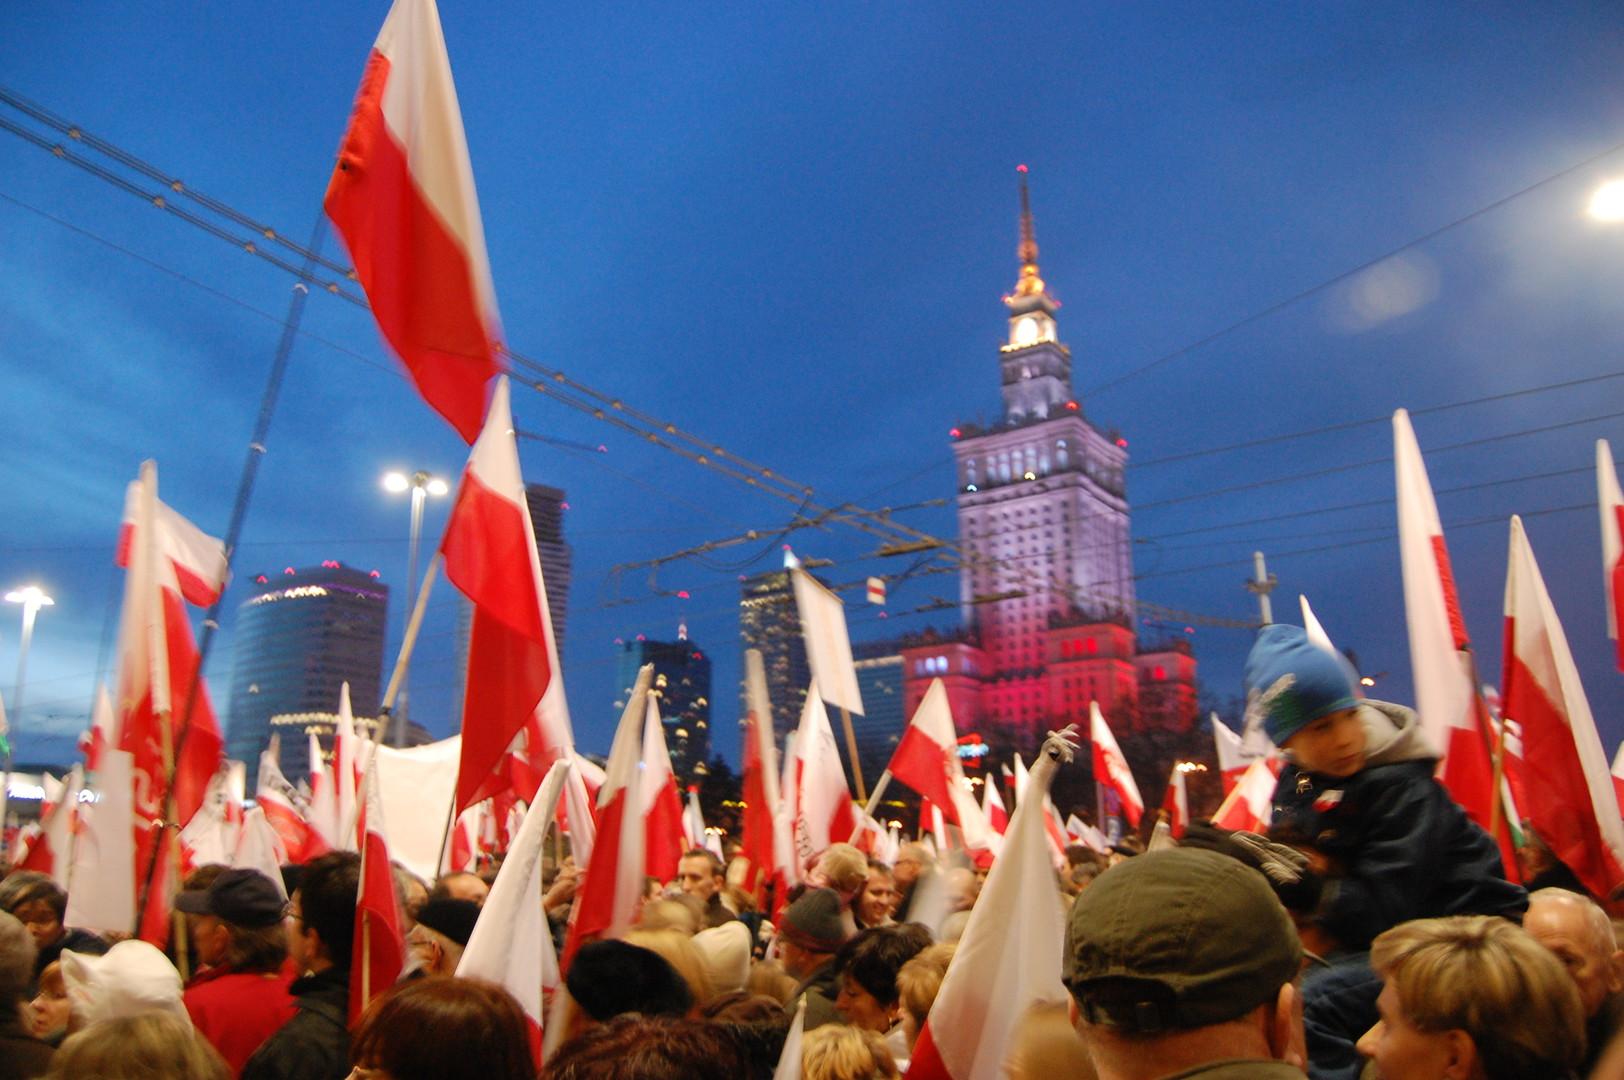 Memches: Polska  Katolickie państwo narodu polskiego